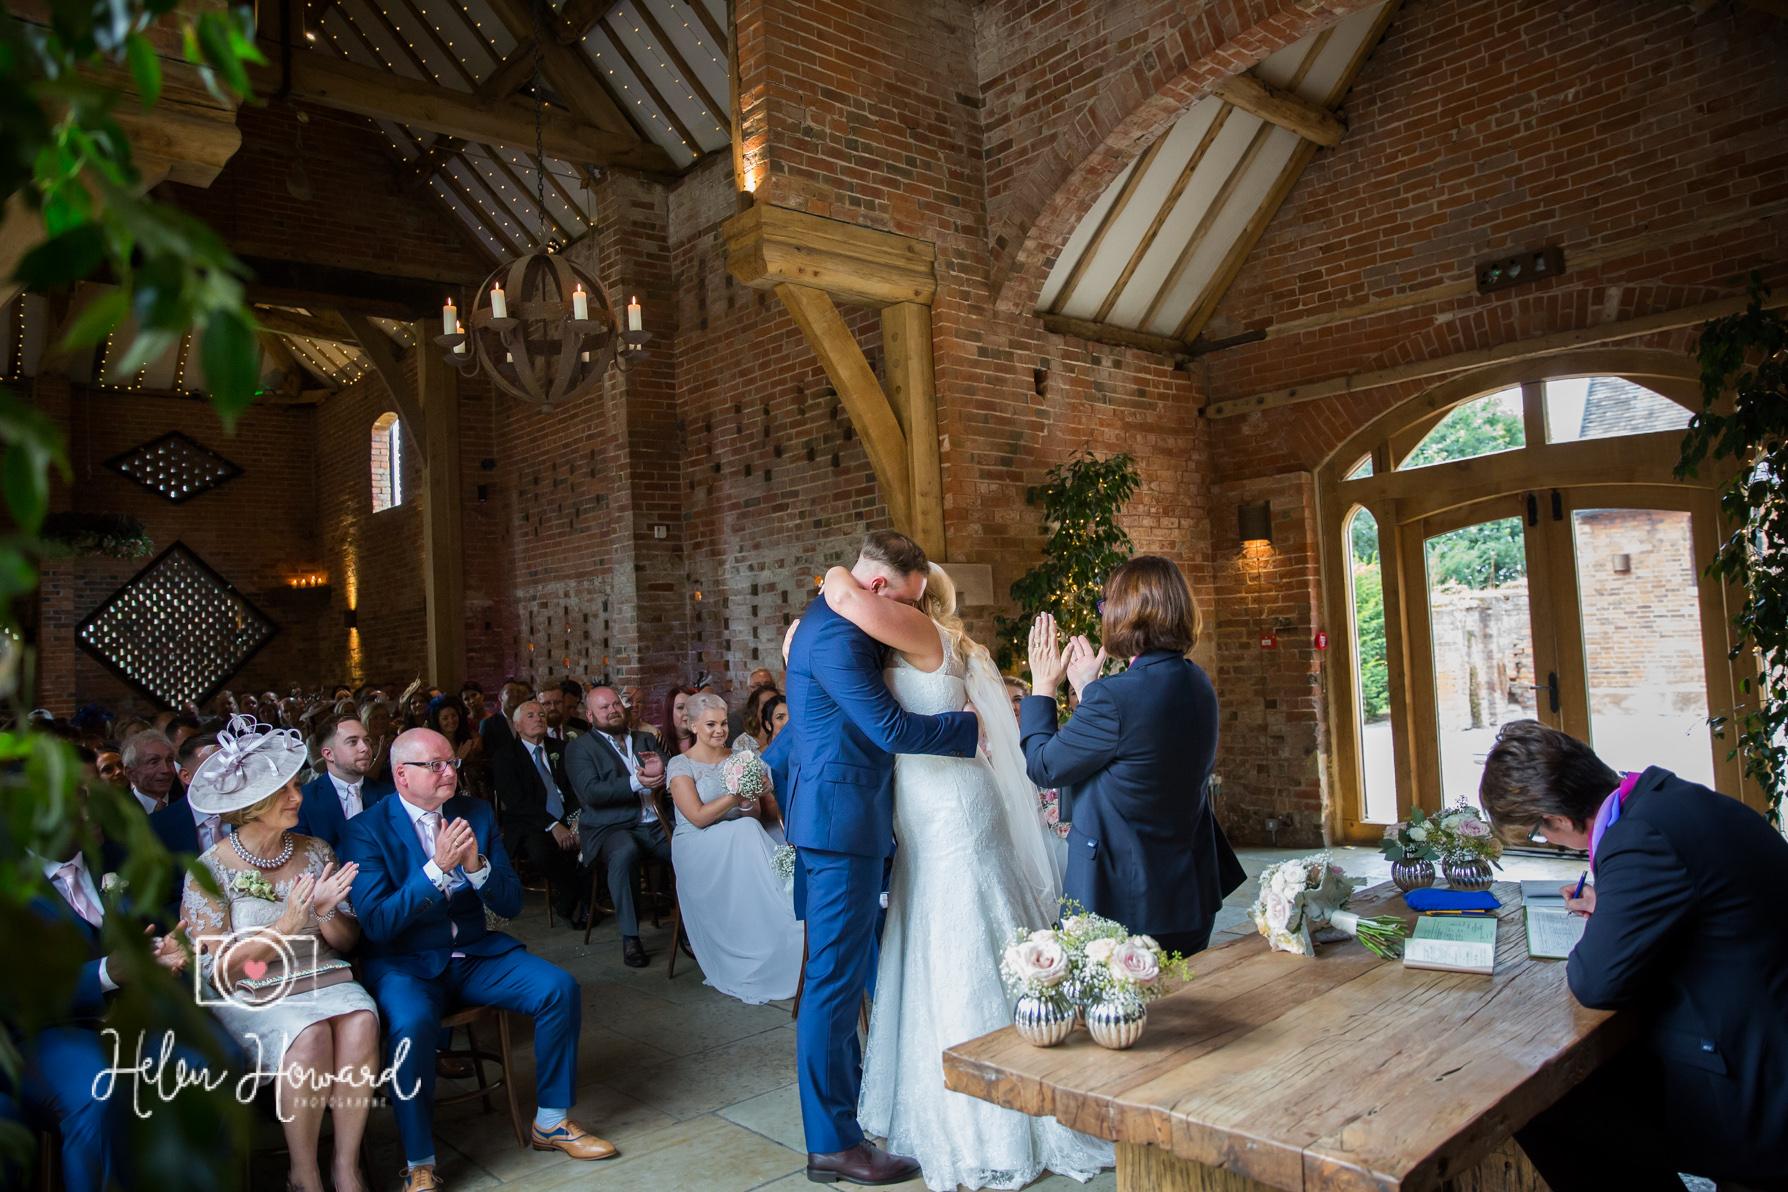 Shustoke Farm Barns Wedding Photography by Helen Howard-19.jpg